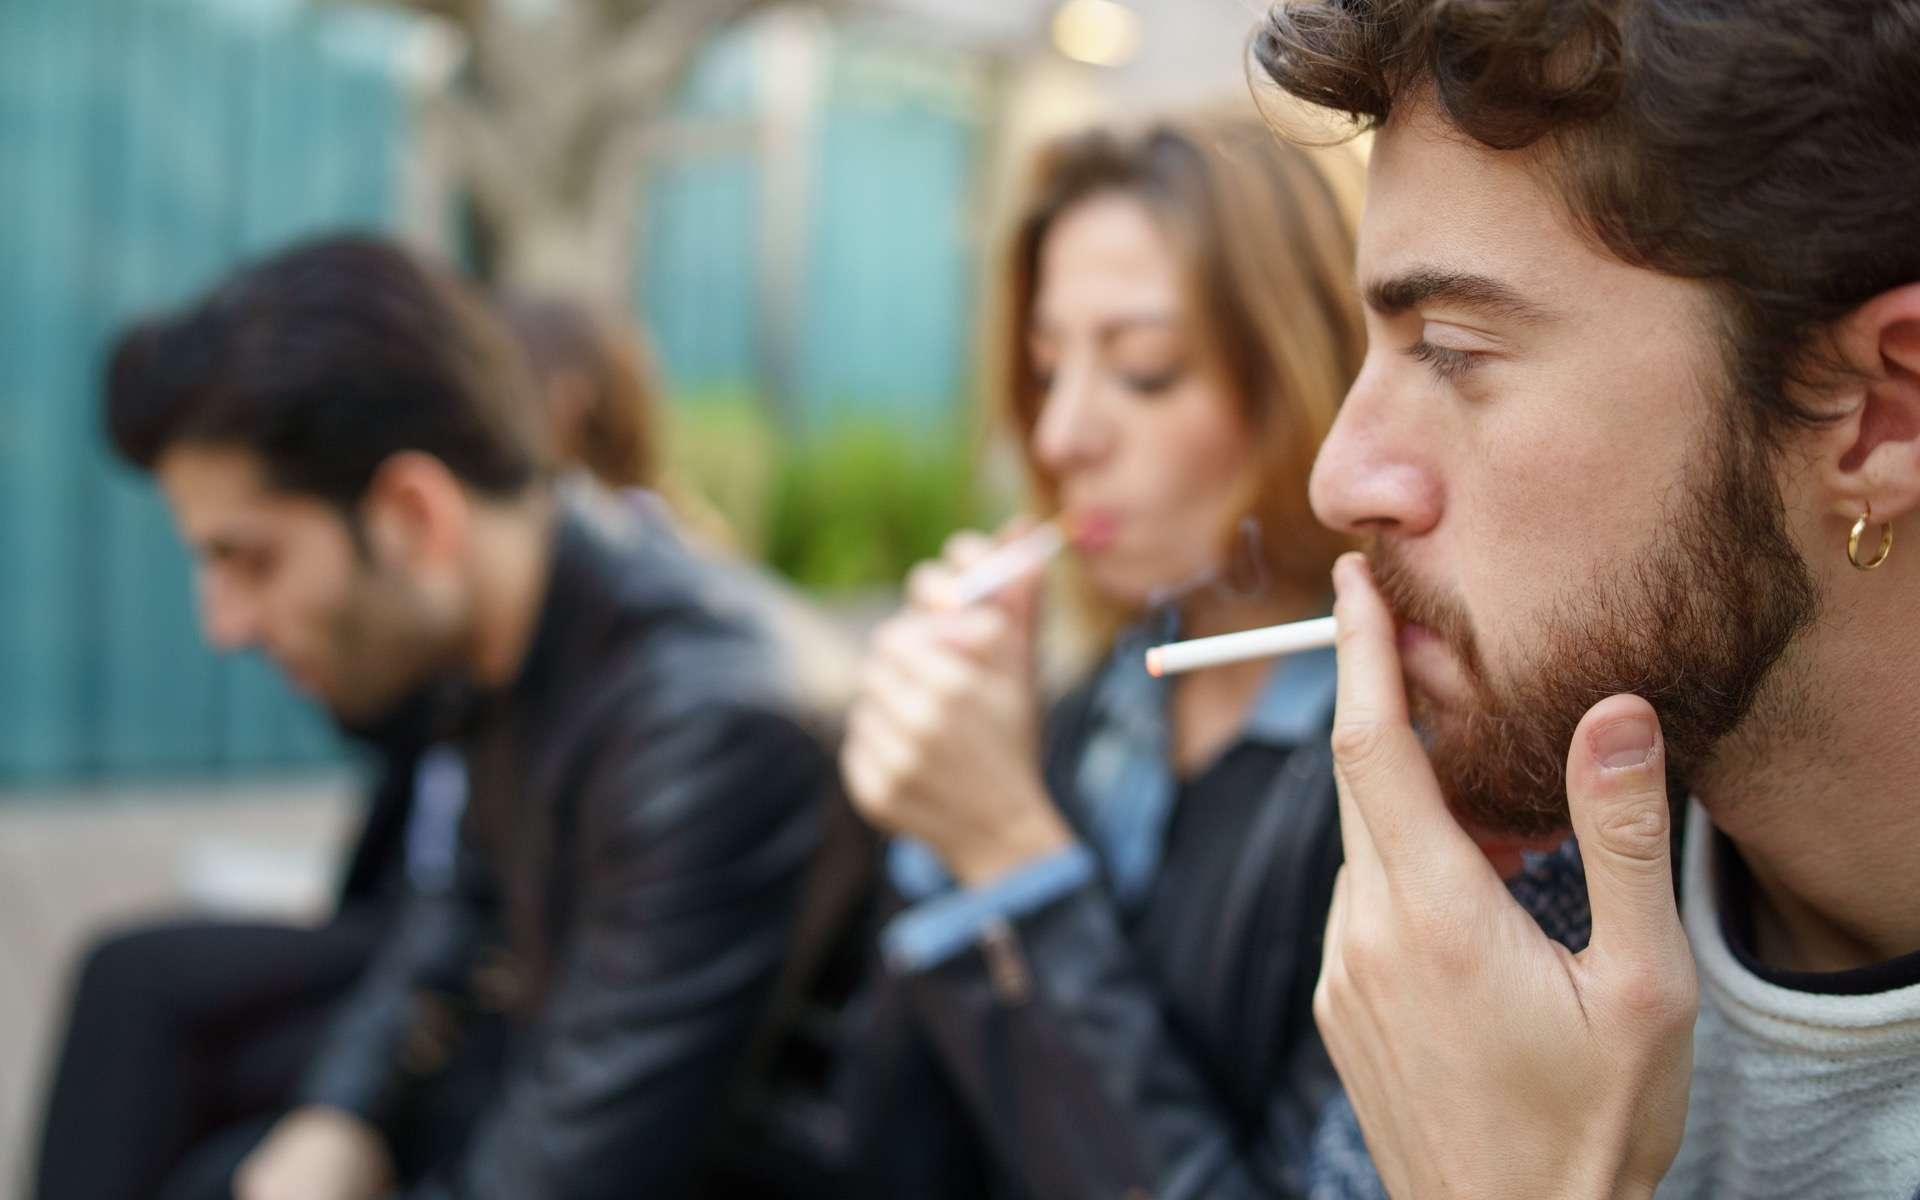 Le tabagisme passif provoque 3.000 morts par an en France ! © G.Lombardo, Adobe Stock